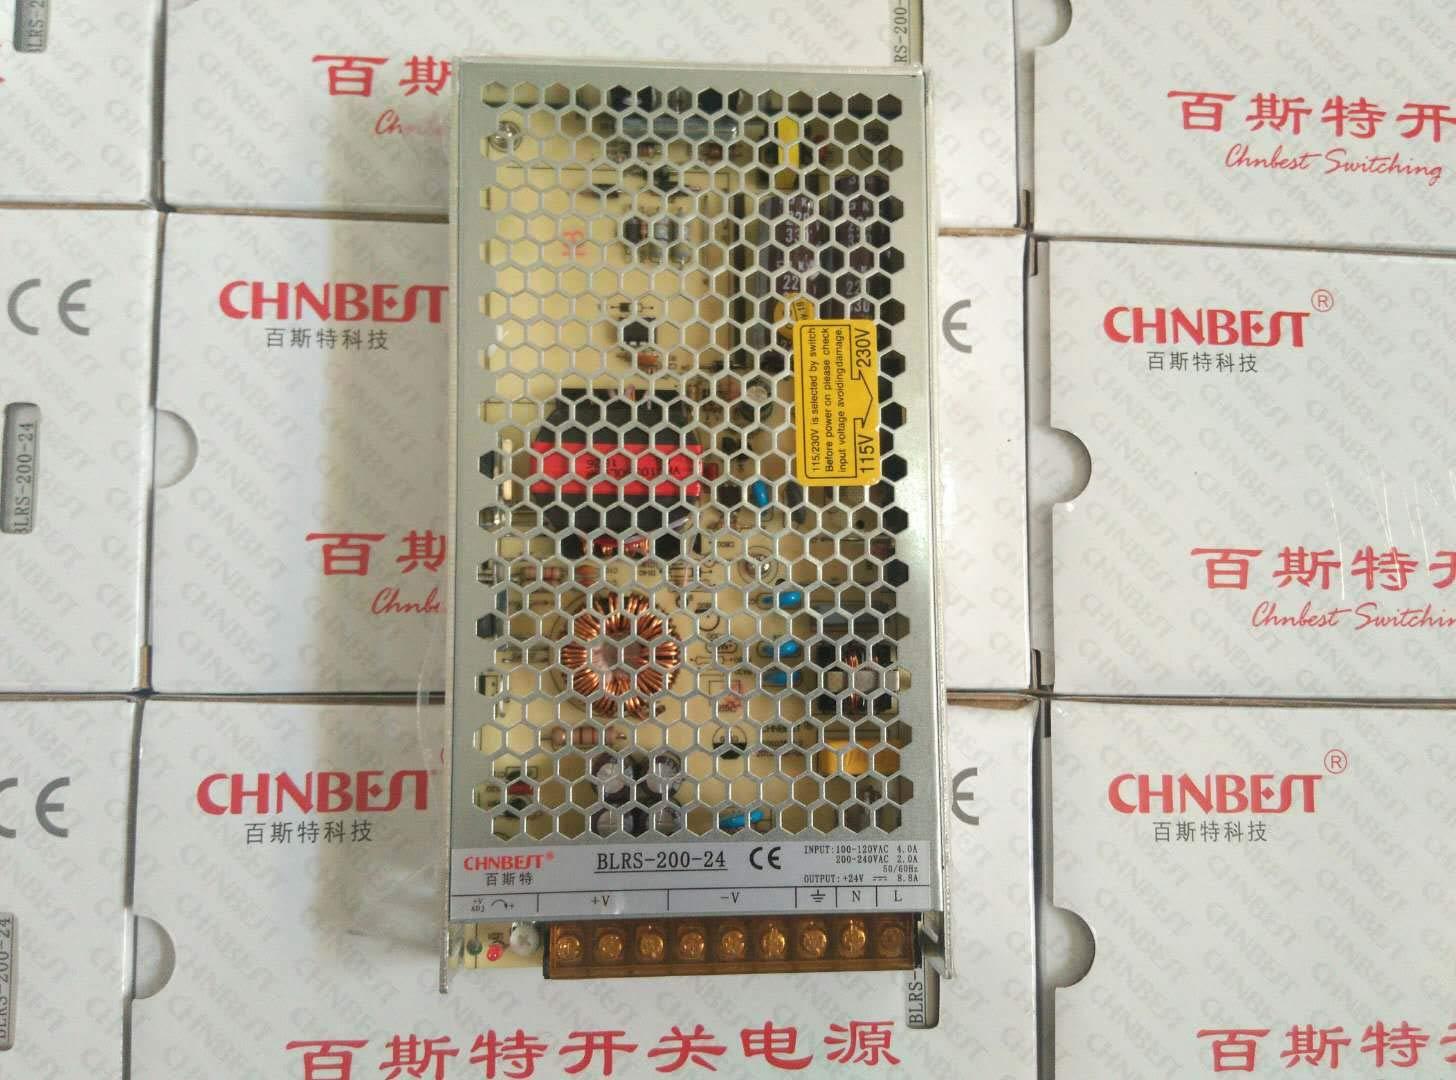 Utini CHN Best BLRS-200W-DC24V Switching Power Supply 200W//24V Regulated Power Supply Conversion Transformer Switch